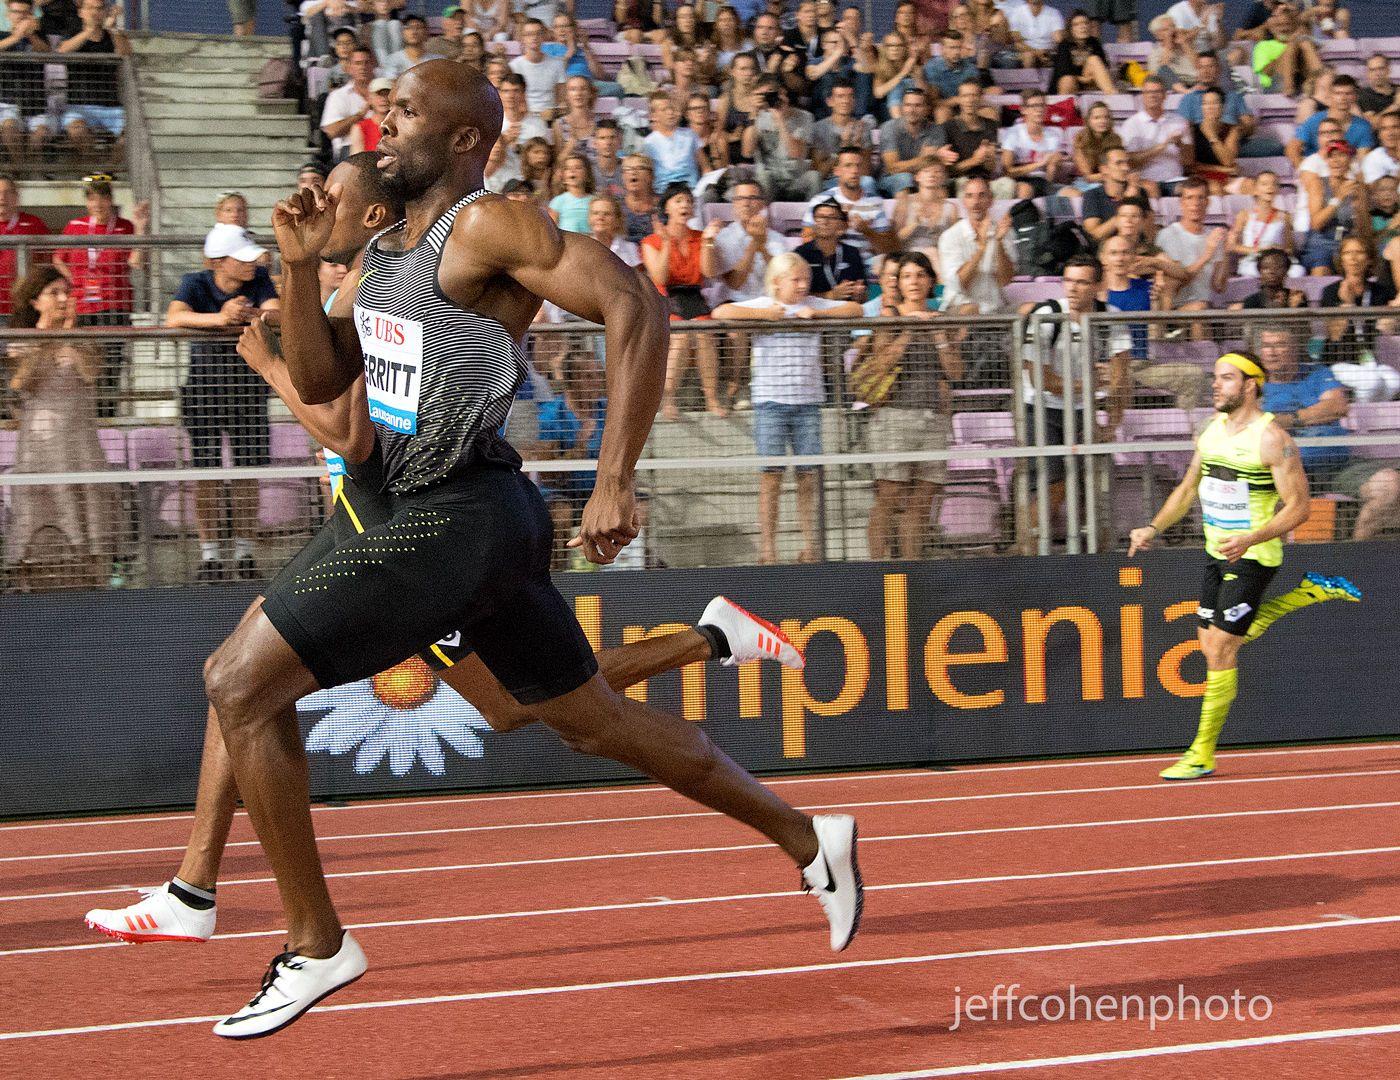 1r2016_athletissima_lausanne_l_merritt_200m_jeff_cohen_photo_180_web.jpg